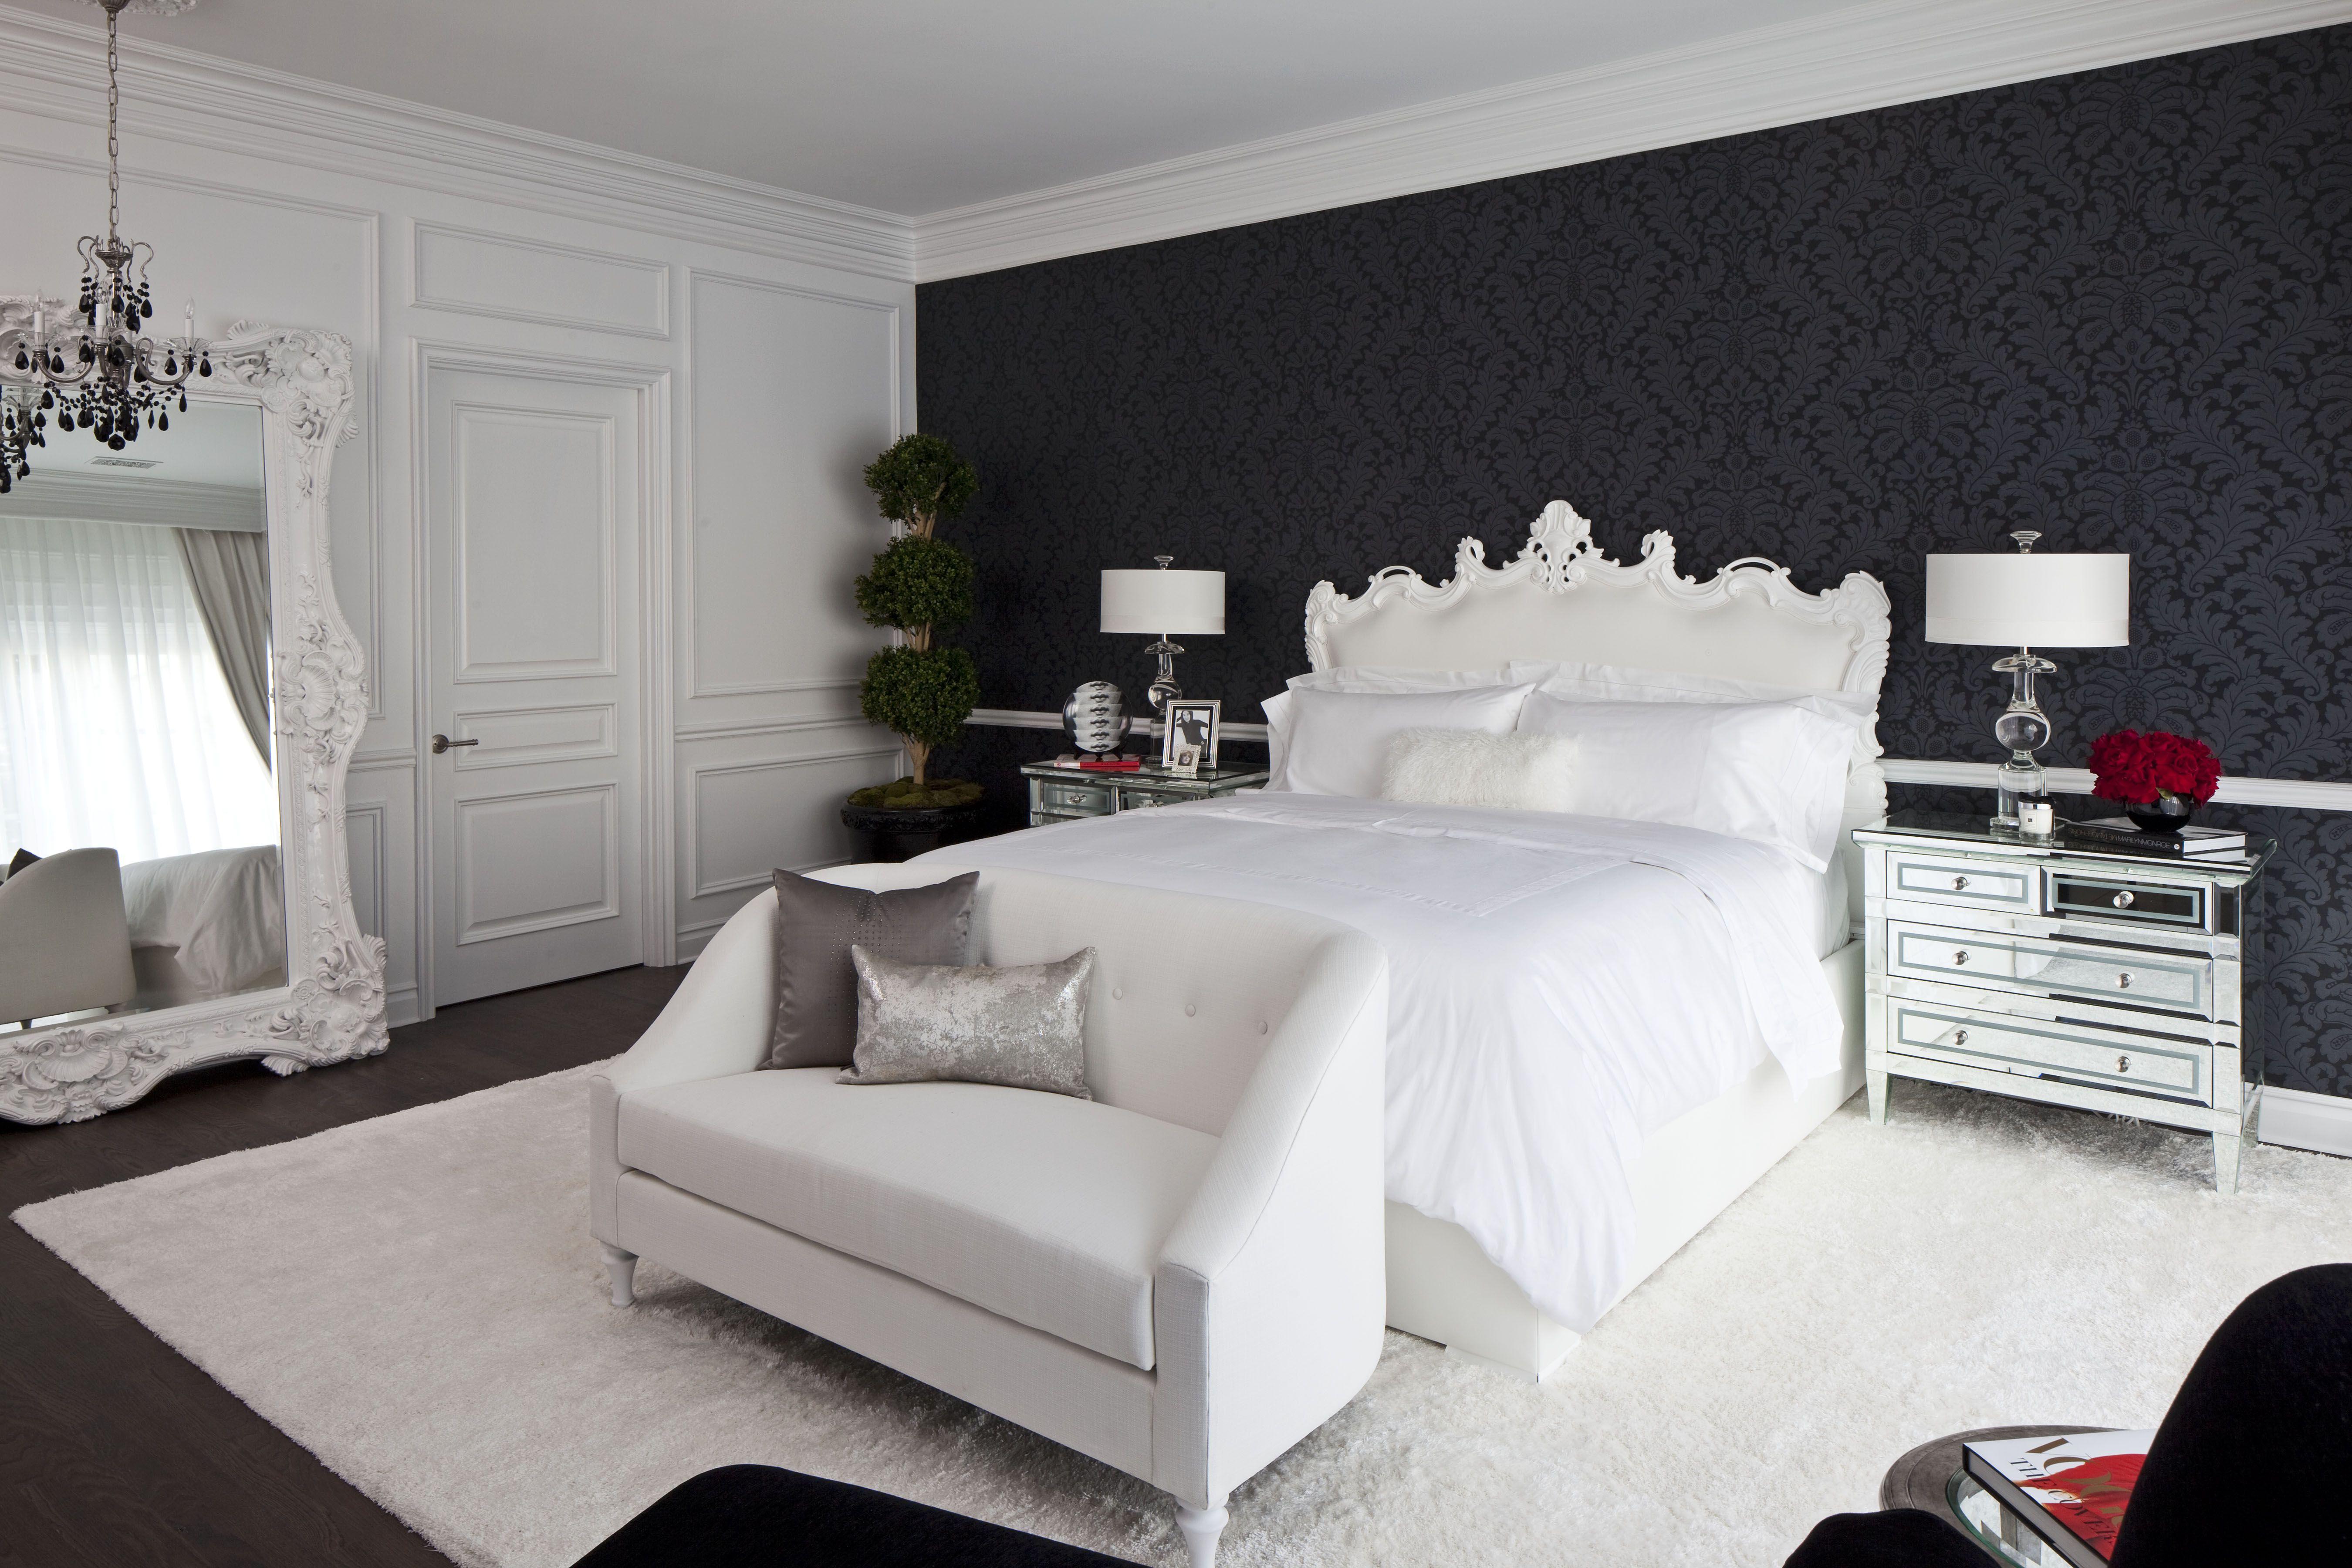 Black and White Bedroom 36 Black and White Bedroom - Bedroom Ideas RJVITMZ